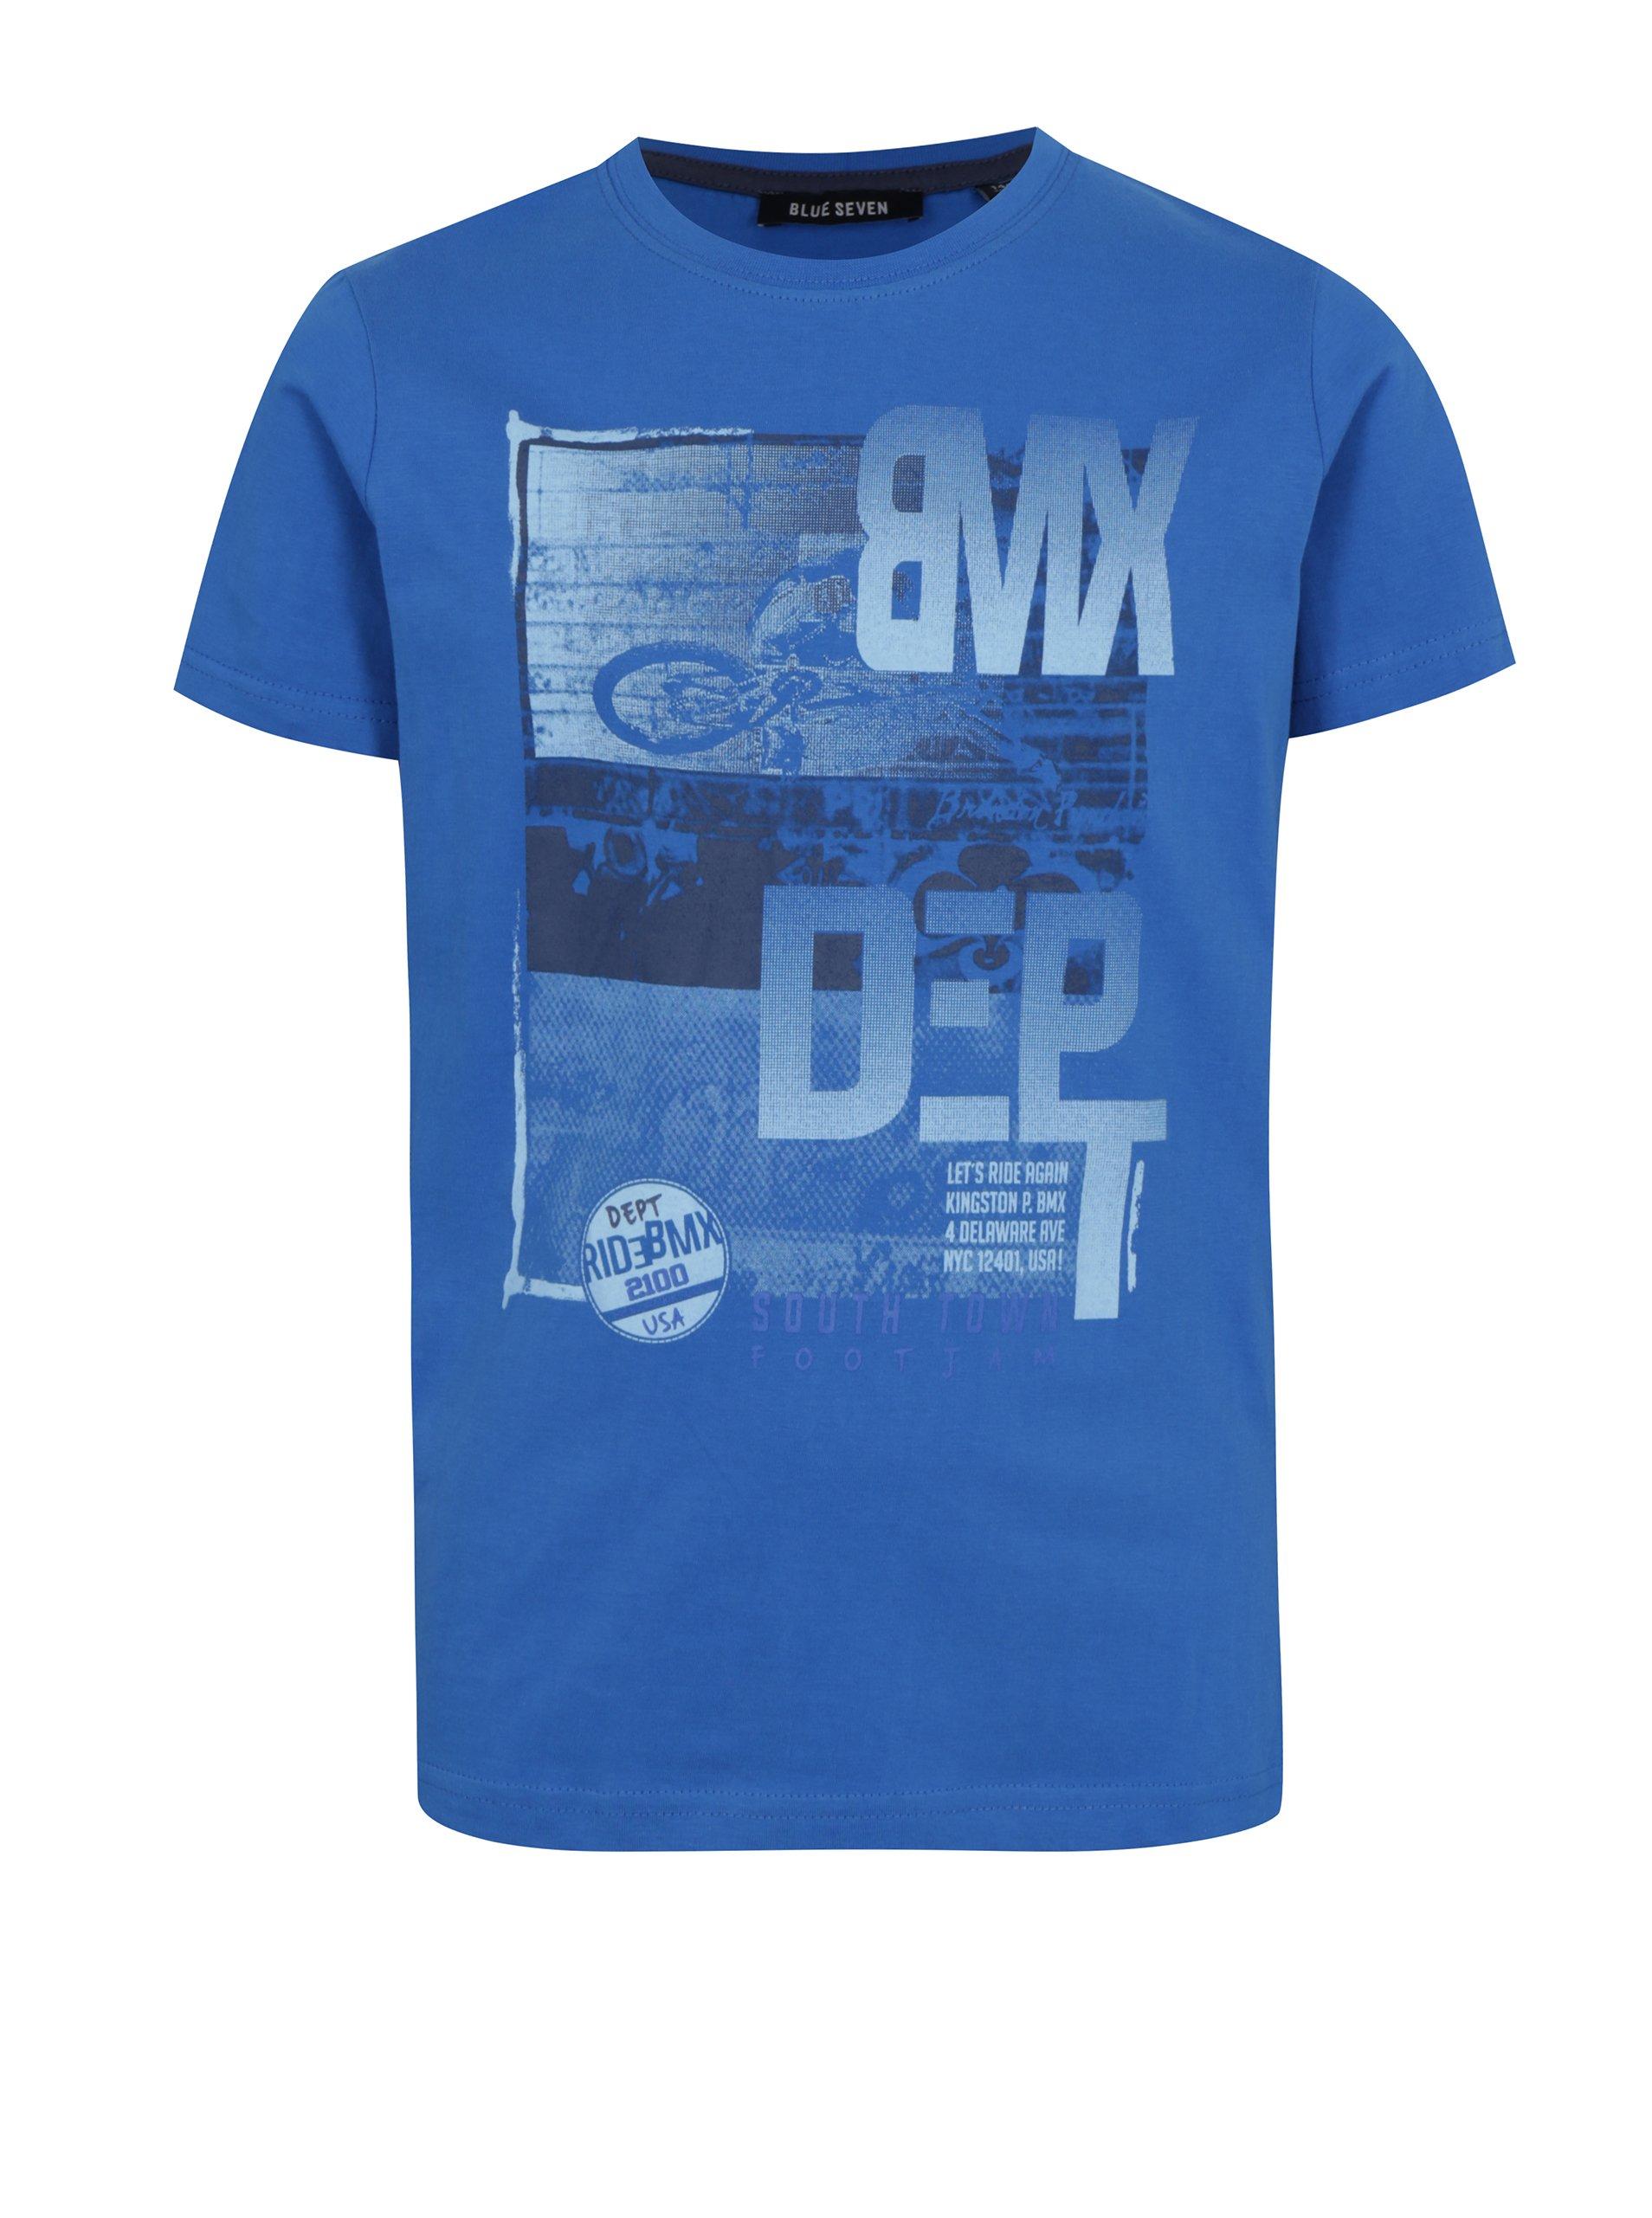 7b843c6c1f7b Modré chlapčenské tričko s potlačou bikera Blue Seven